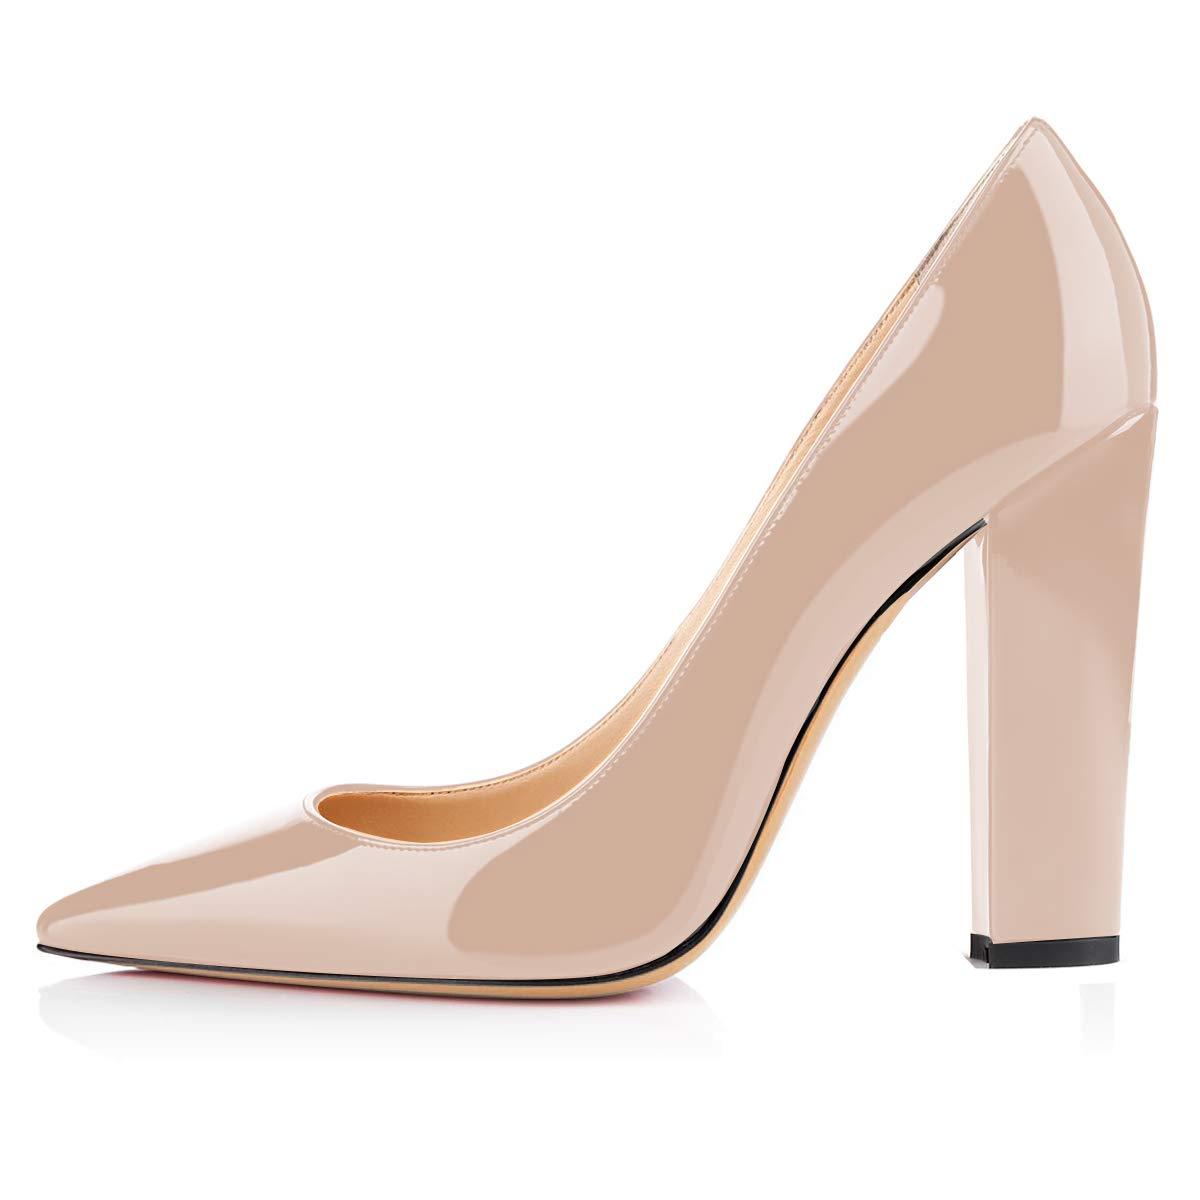 Eldof Womens Block Heel Pumps Pointed Toe Chunky Heel Pumps Classic Slip On 4 Heels Wedding Party Office Pumps for Women